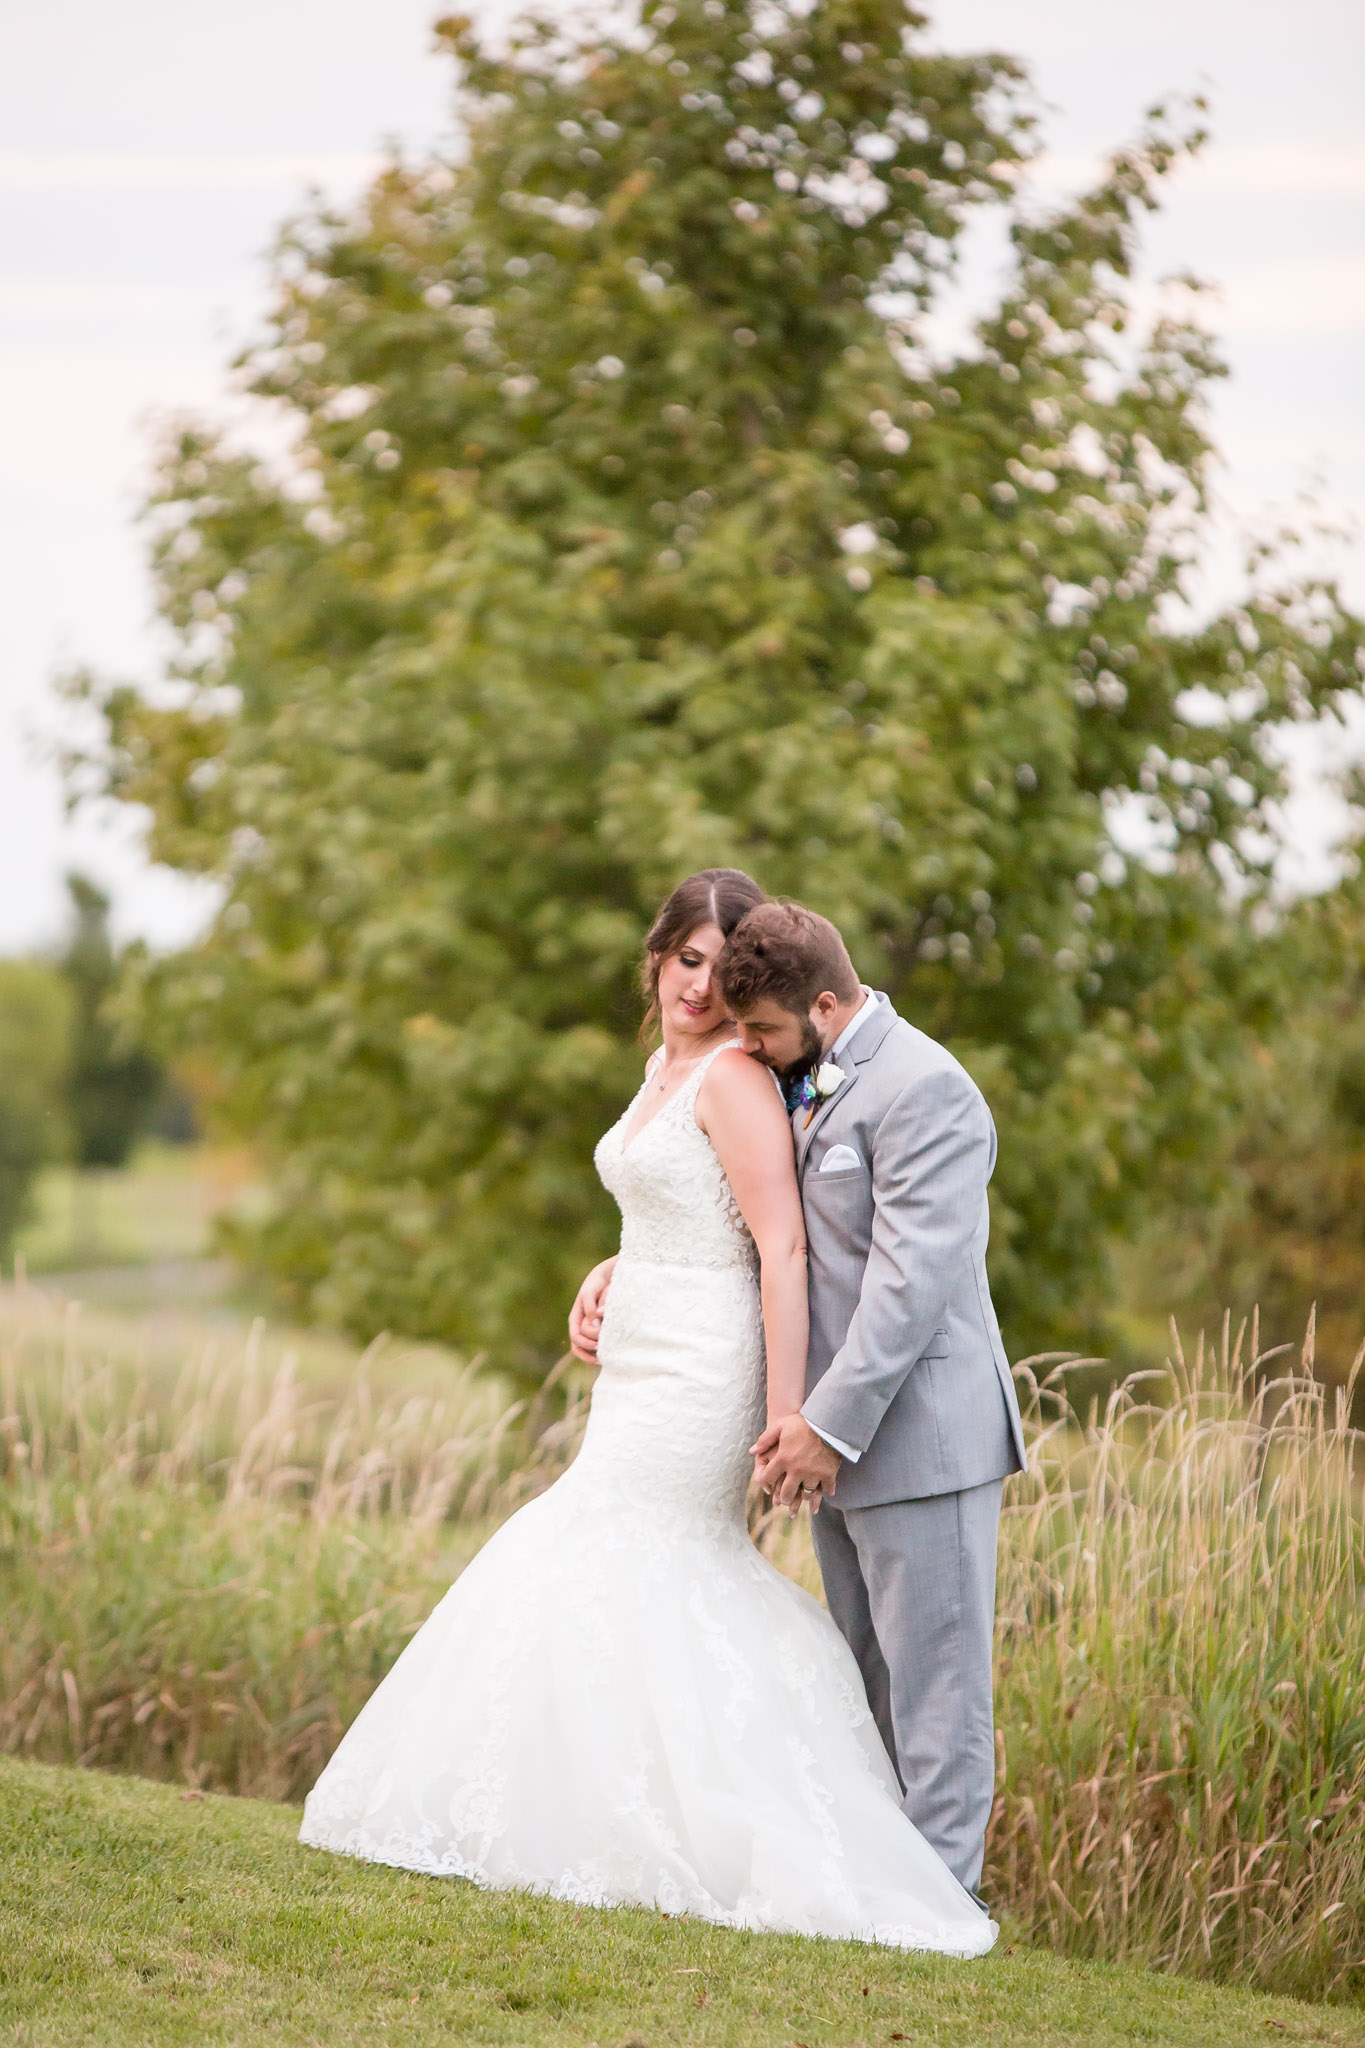 Brookstreet Hotel weddings #ottawa #wedding  #photographer-3511.jpg